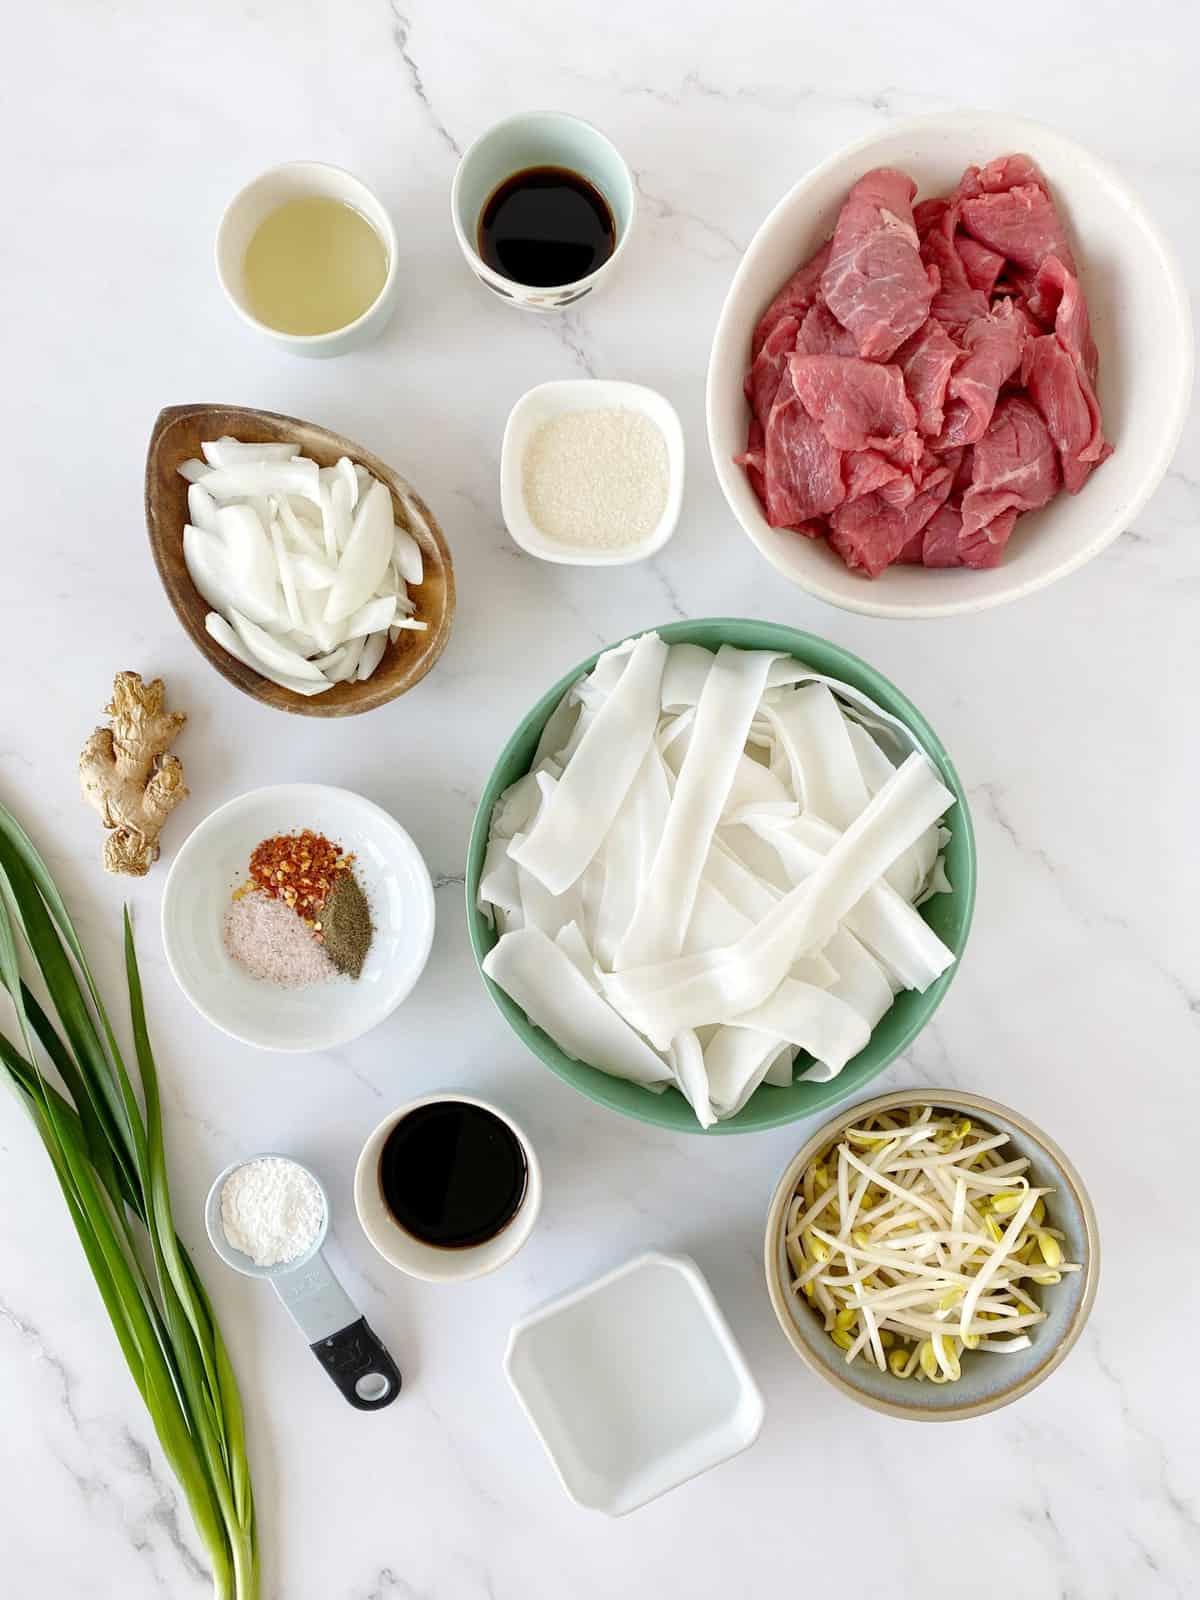 over the top ingredients with noodles, beef, seasonings